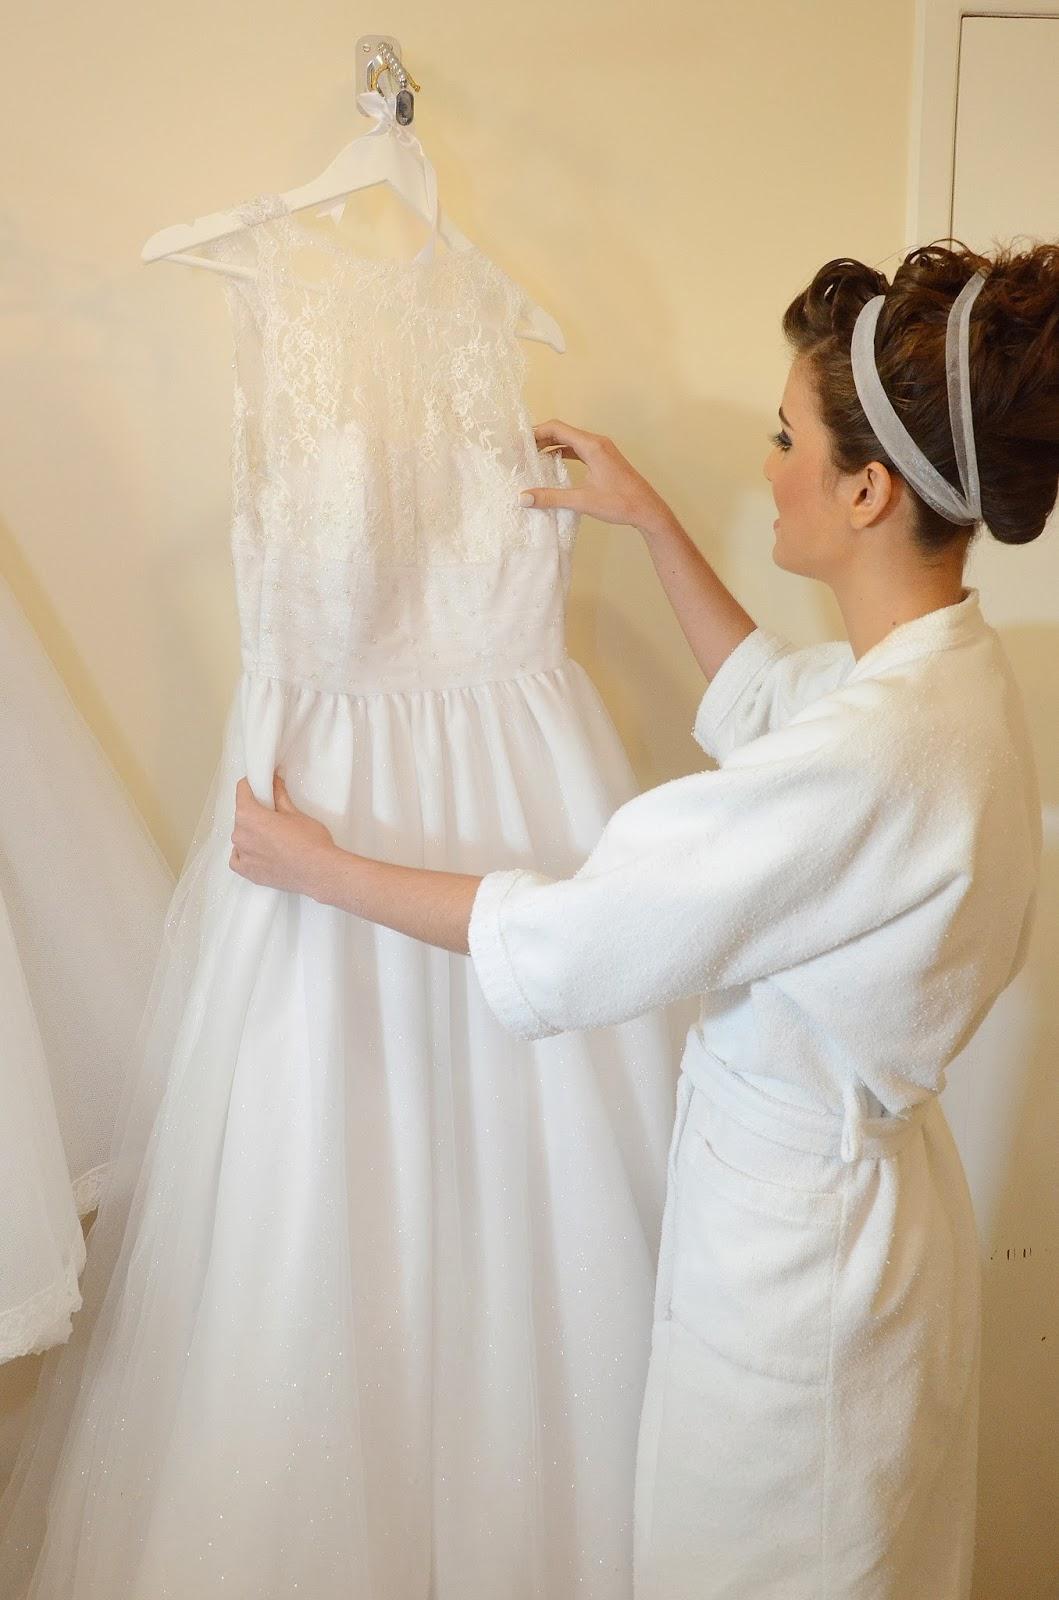 noiva - making of da noiva - making of - dia da noiva - make - cabelo - penteado - vestido de noiva - vestido - vestido pendurado - tiara